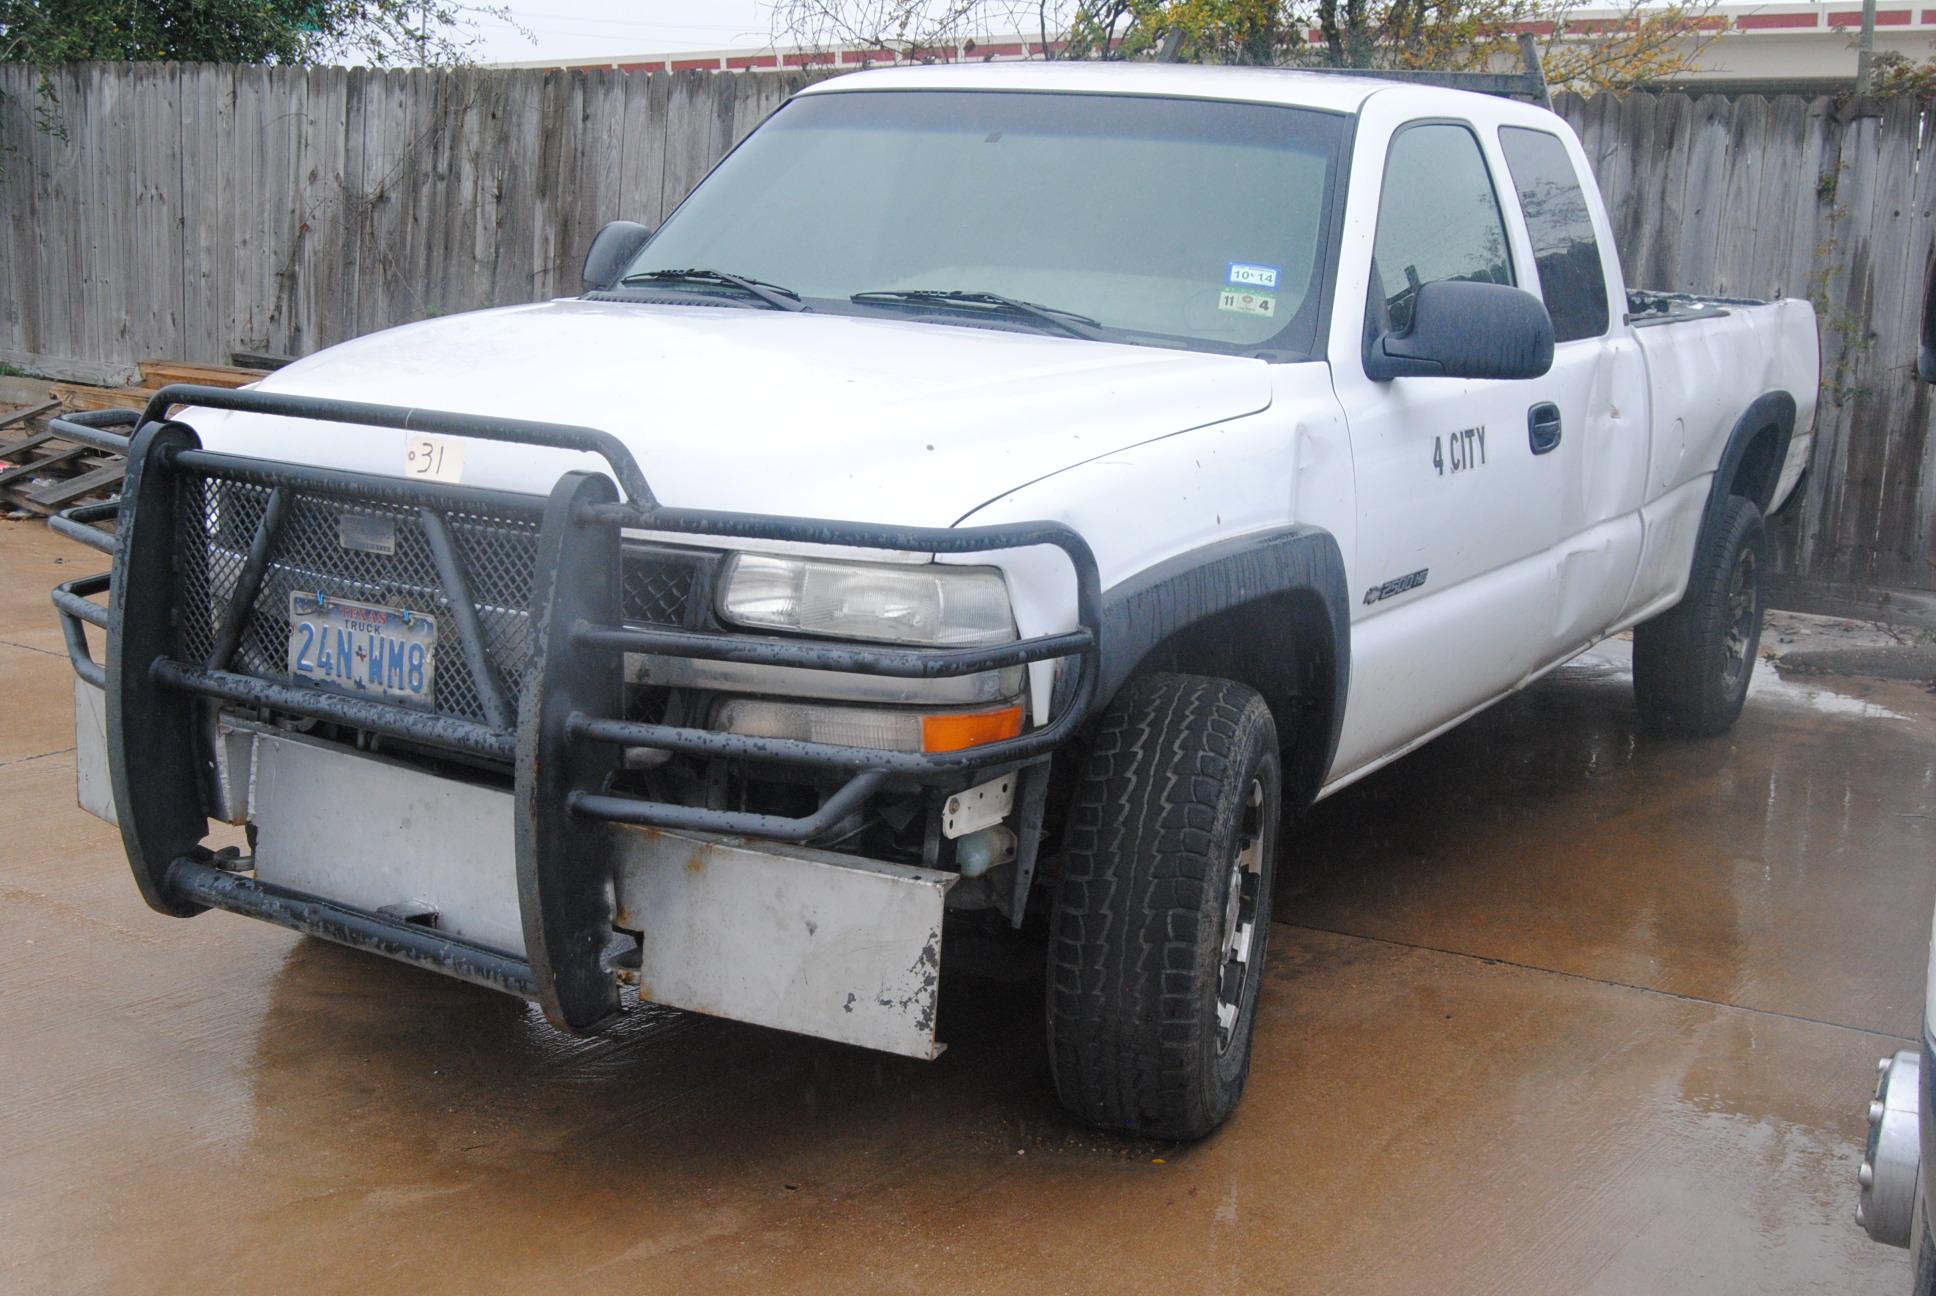 Lot 31 - '01 Chevrolet Work Truck